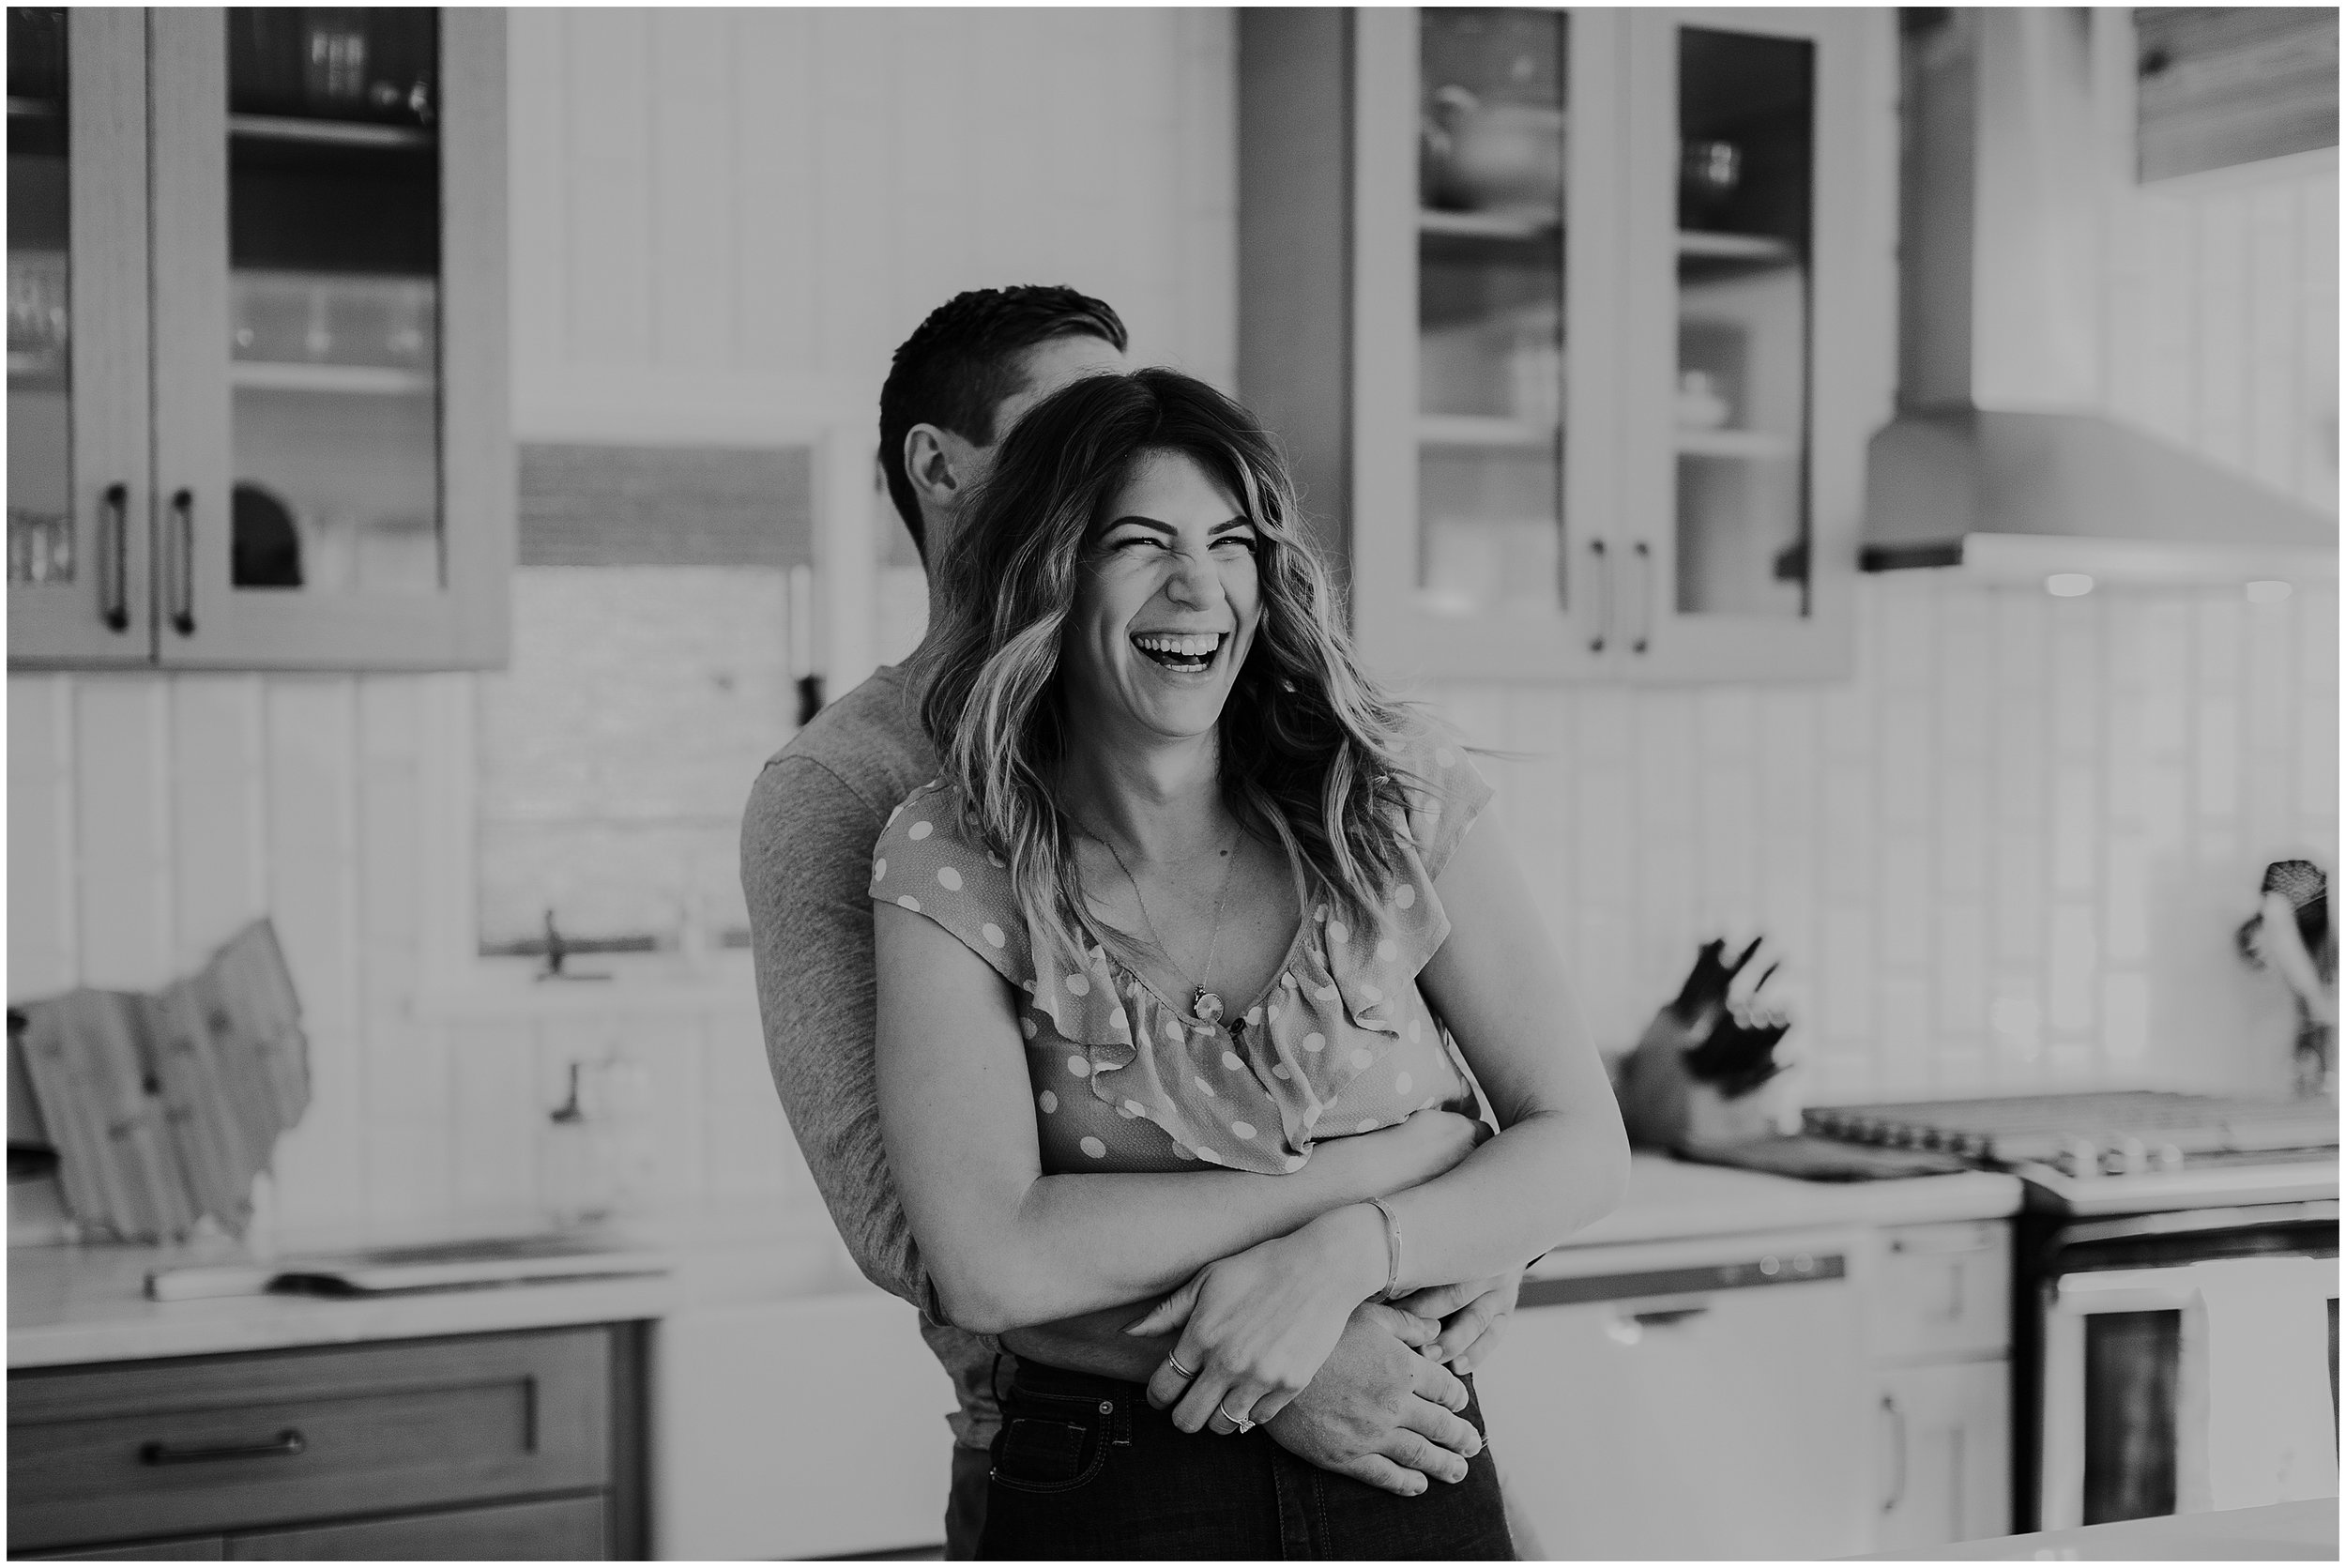 Madison Braun Photography | www.madisonbraunphotography.com | #engagement #lovers #inhomesession #inhome #bohophotographer #destinationweddingphotographer #travelphotographer #travelingphotographer #charlestonphotographer #bohophotographer #engagementphotographer #engagementsession #destinationwedding #destinationweddingphotographer